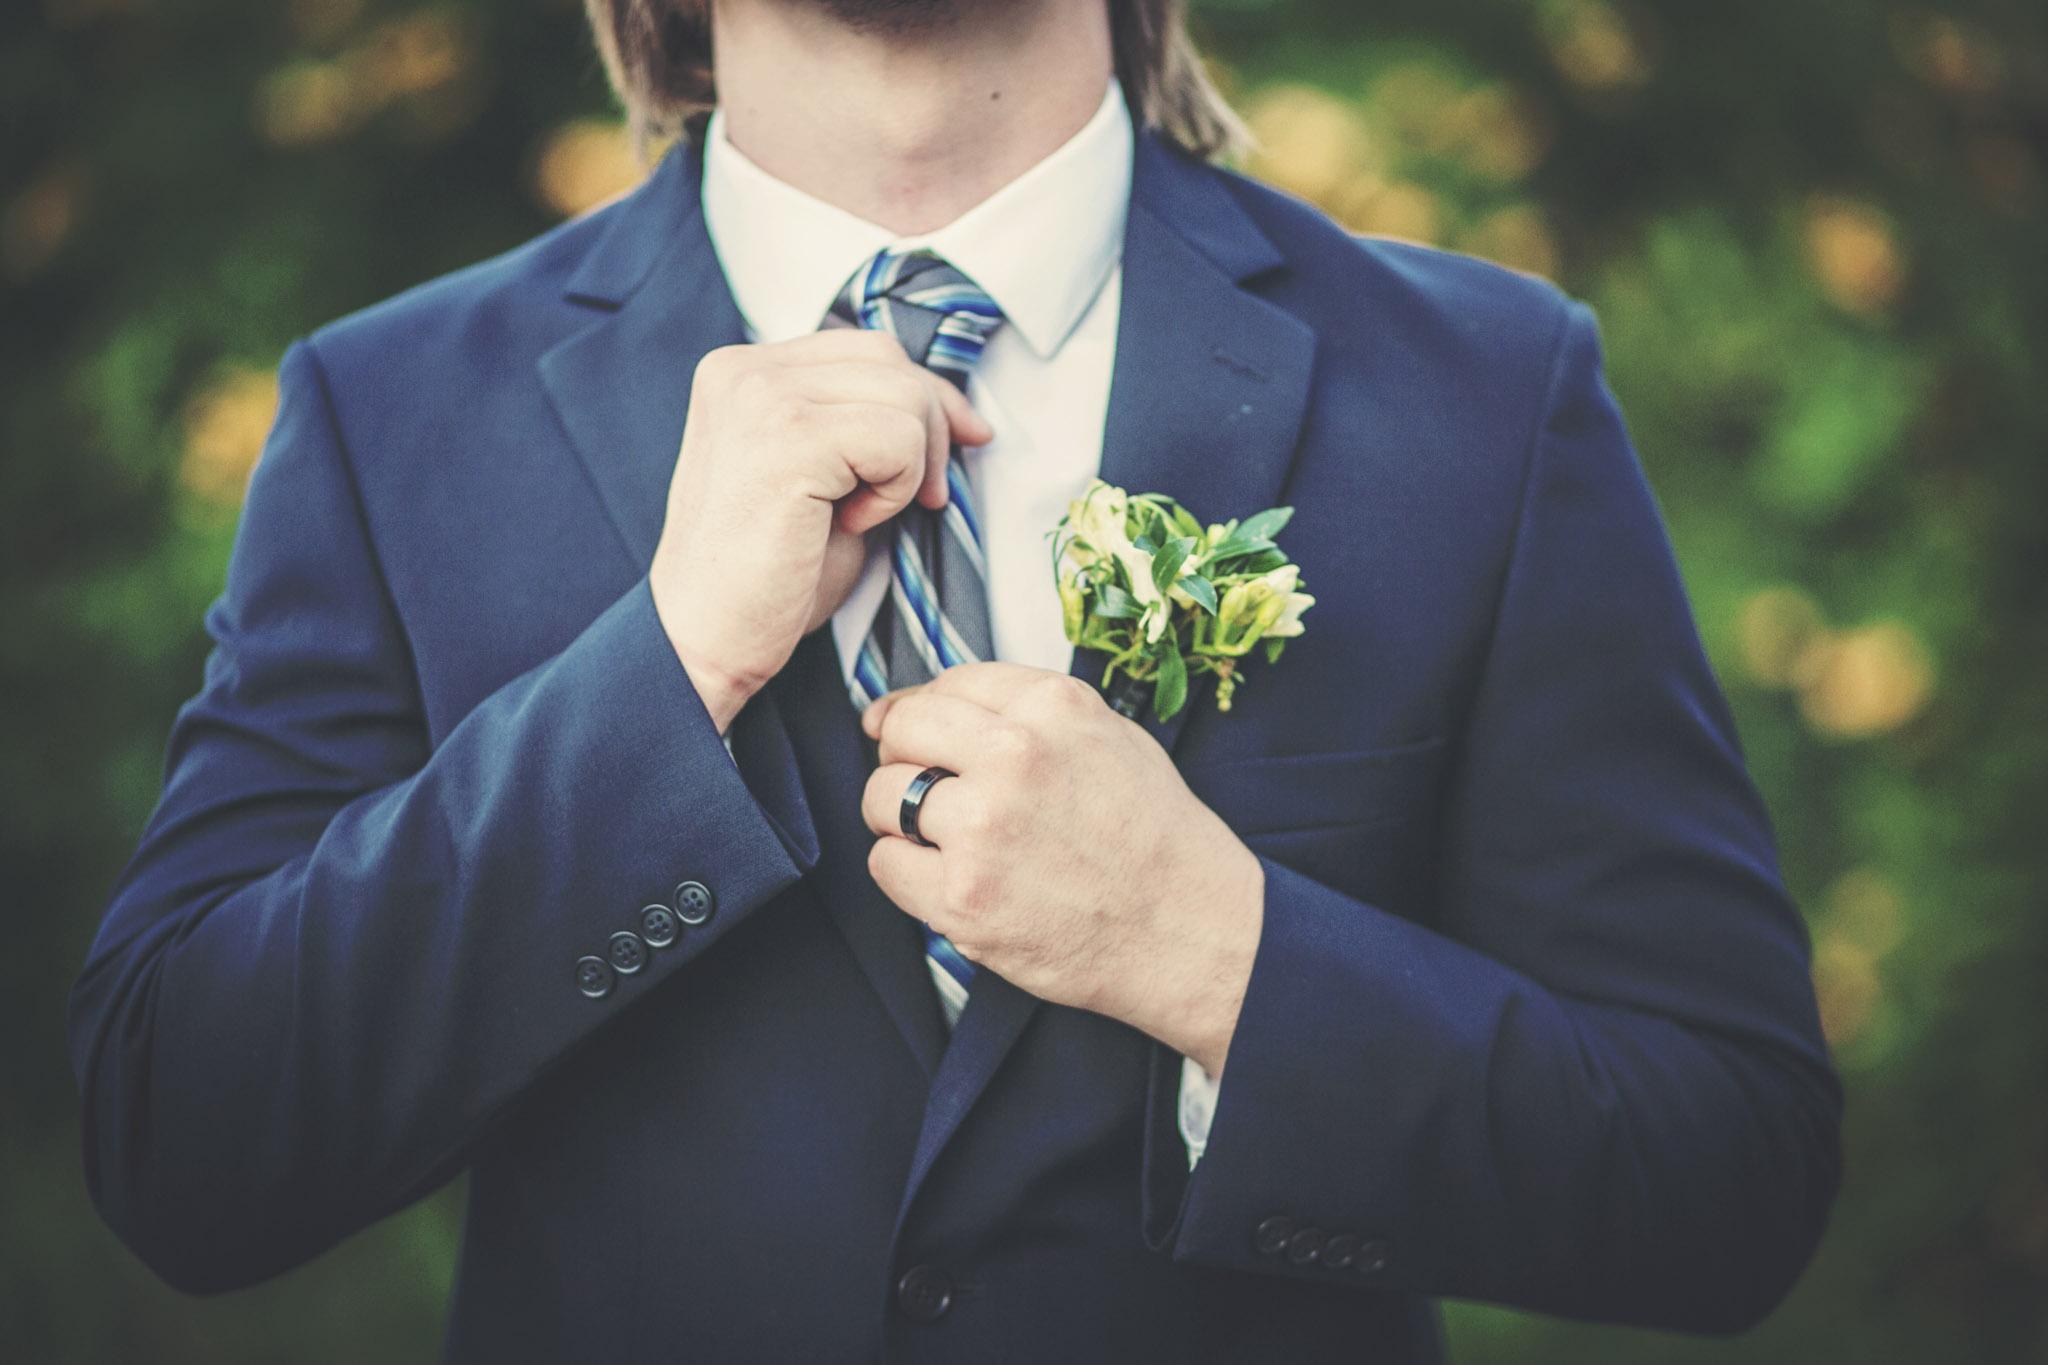 Kansas_City_Small_Wedding_Venue_Elope_Intimate_Ceremony_Budget_Affordable_Sophie&Philip_270b.jpg